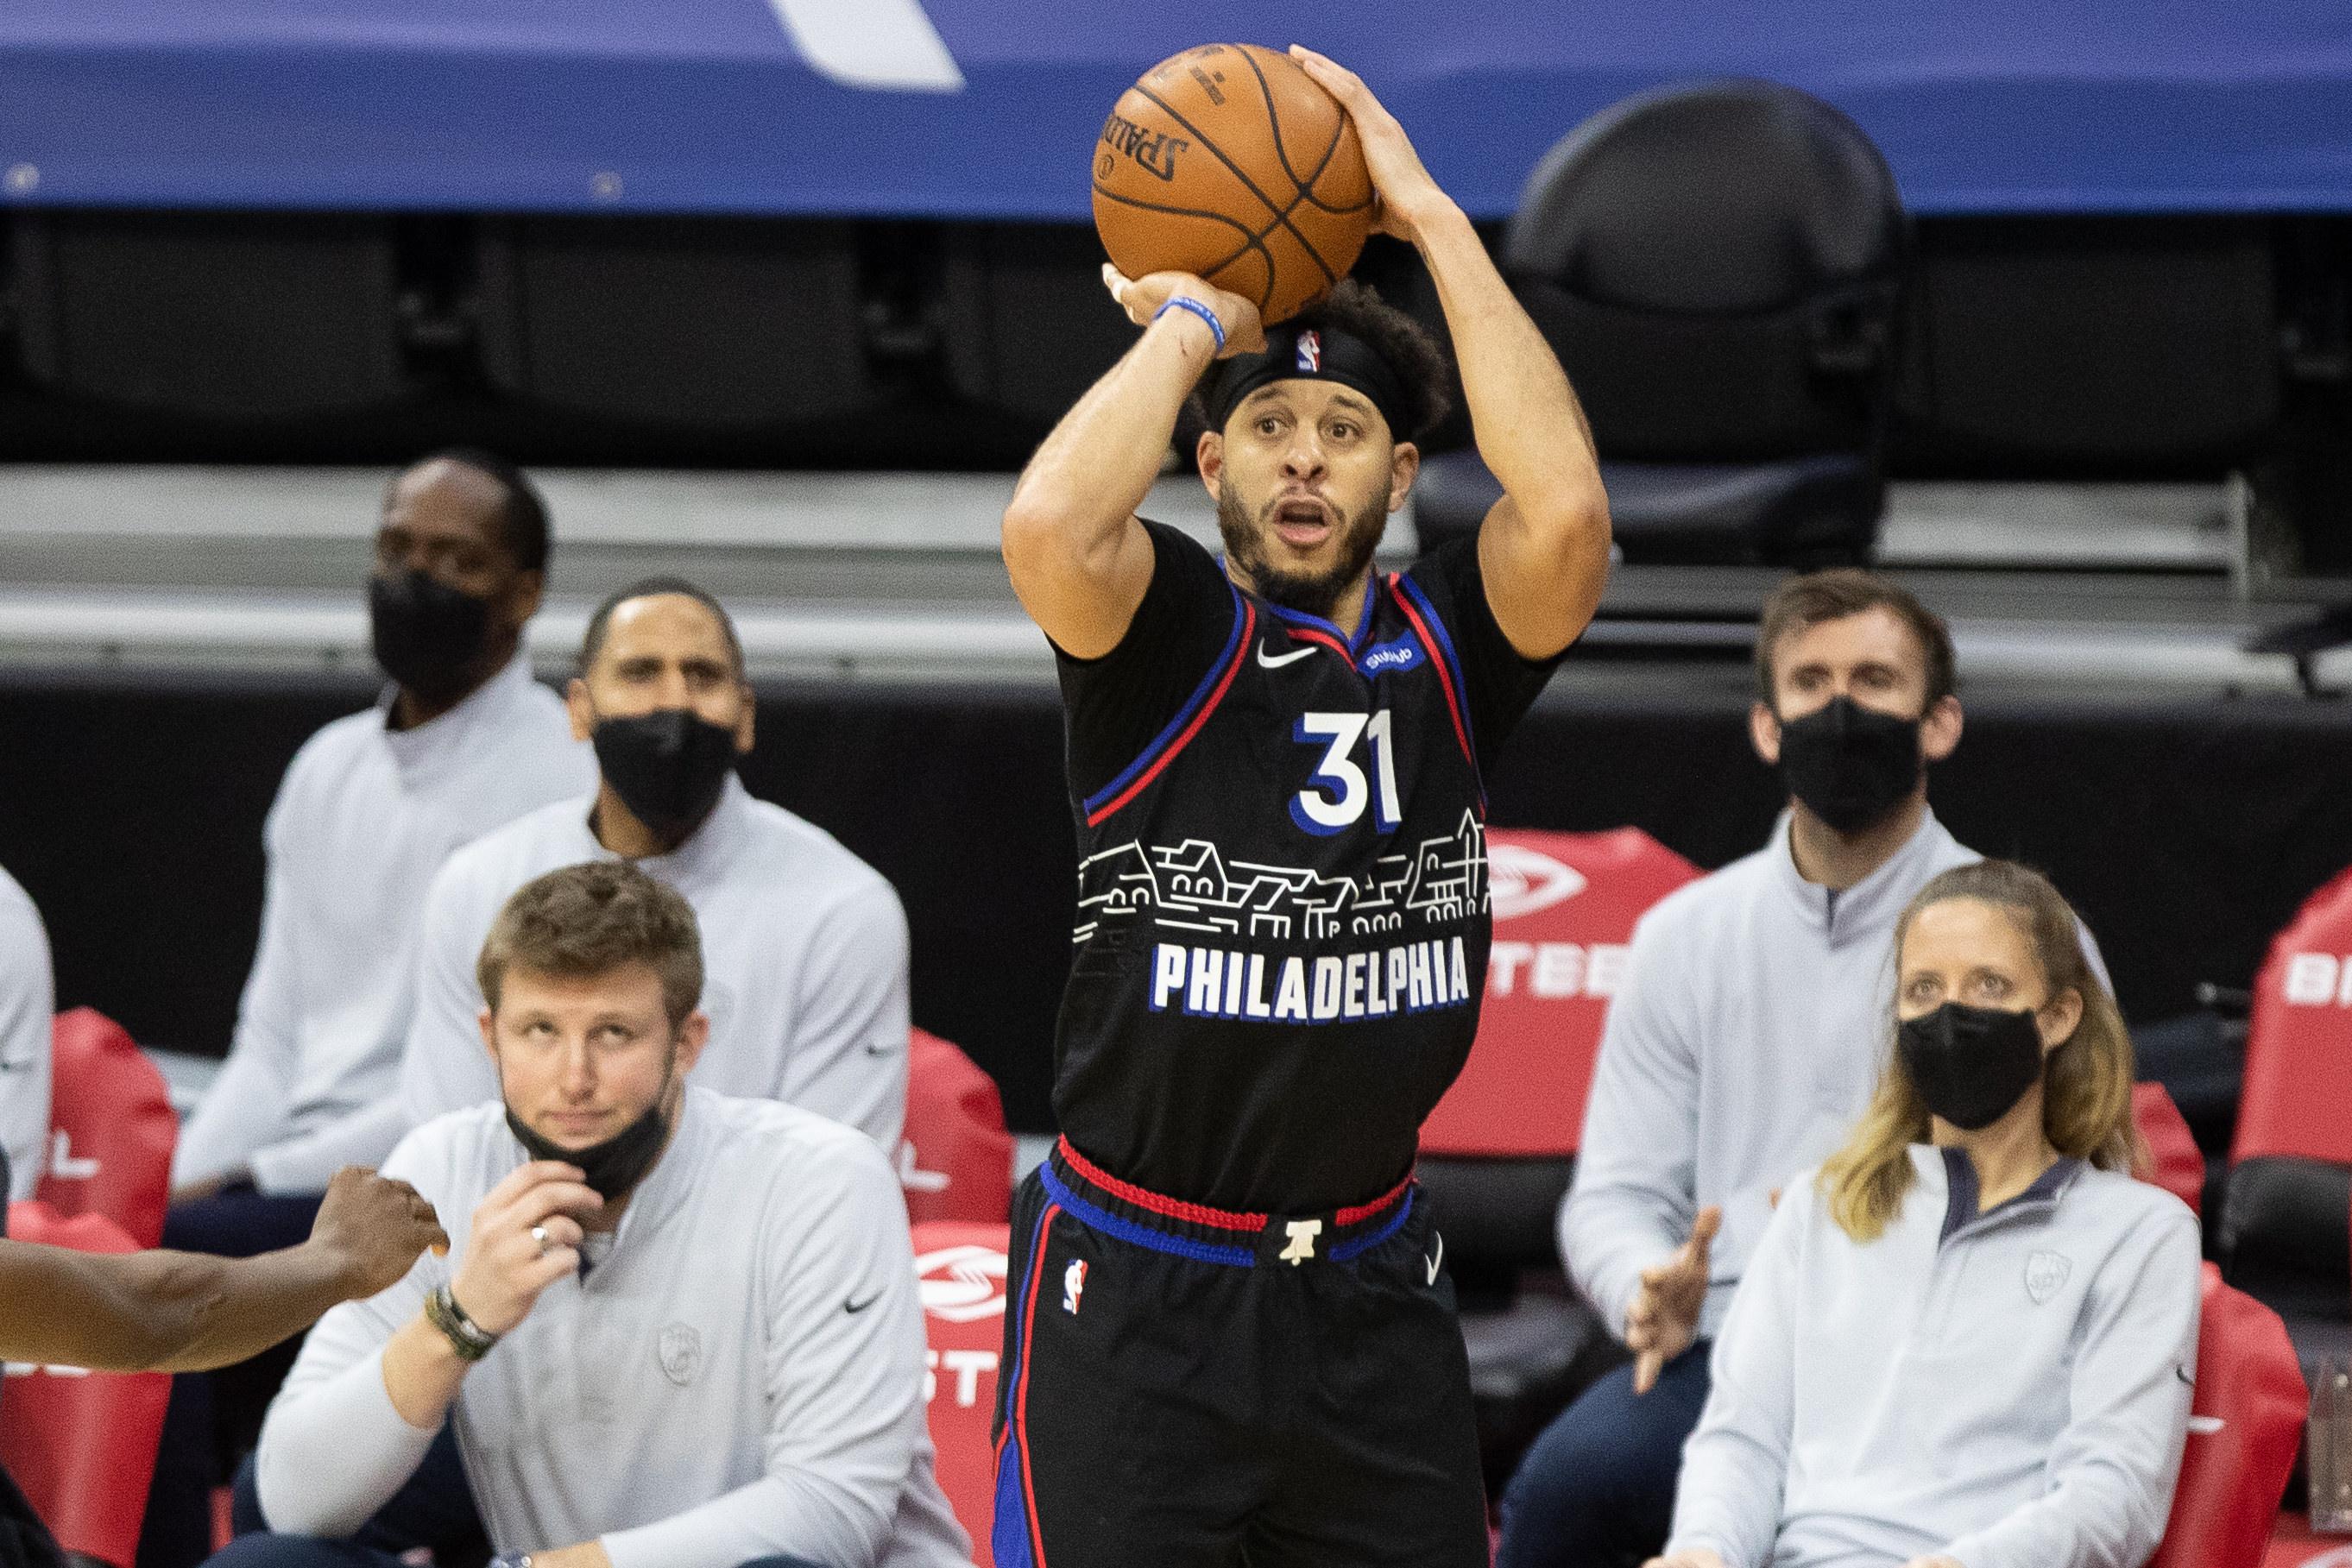 Feb 27, 2021; Philadelphia, Pennsylvania, USA; Philadelphia 76ers guard Seth Curry (31) shoots against the Cleveland Cavaliers during the third quarter at Wells Fargo Center.